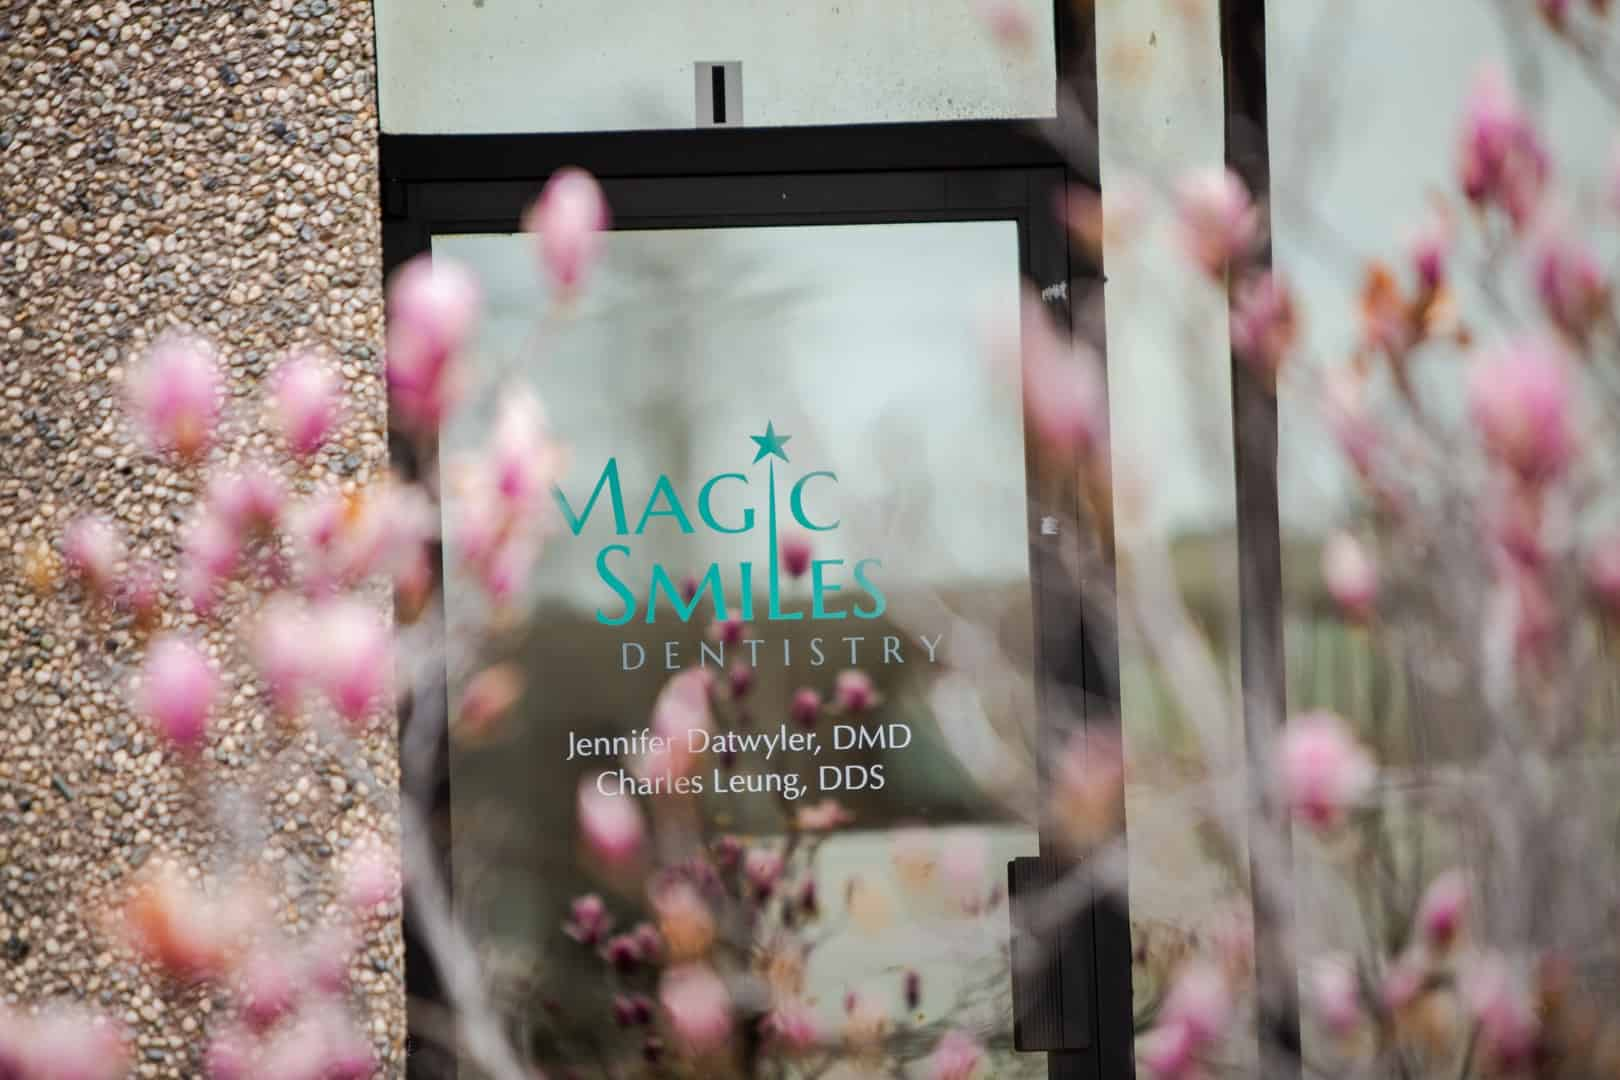 magic smiles dentistry El Dorado Hills Post Edit 17 2 - Get Directions